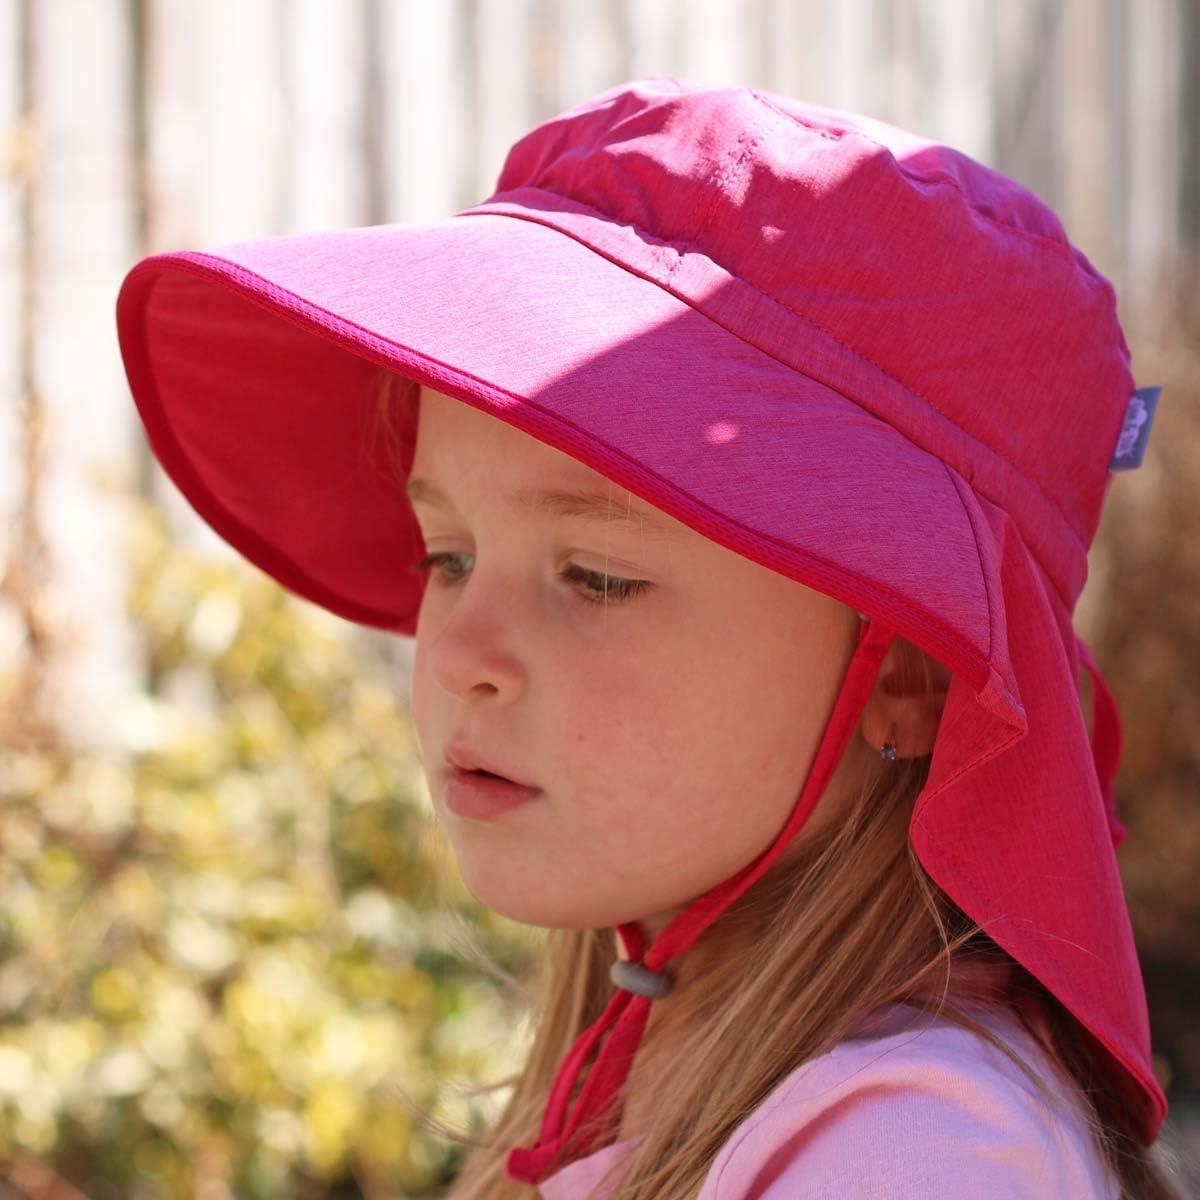 Jan /& Jul Baby Toddler Kids Wide Brim 50 UPF Sun-Hat with Neck Flap Chin-Strap Adjustable